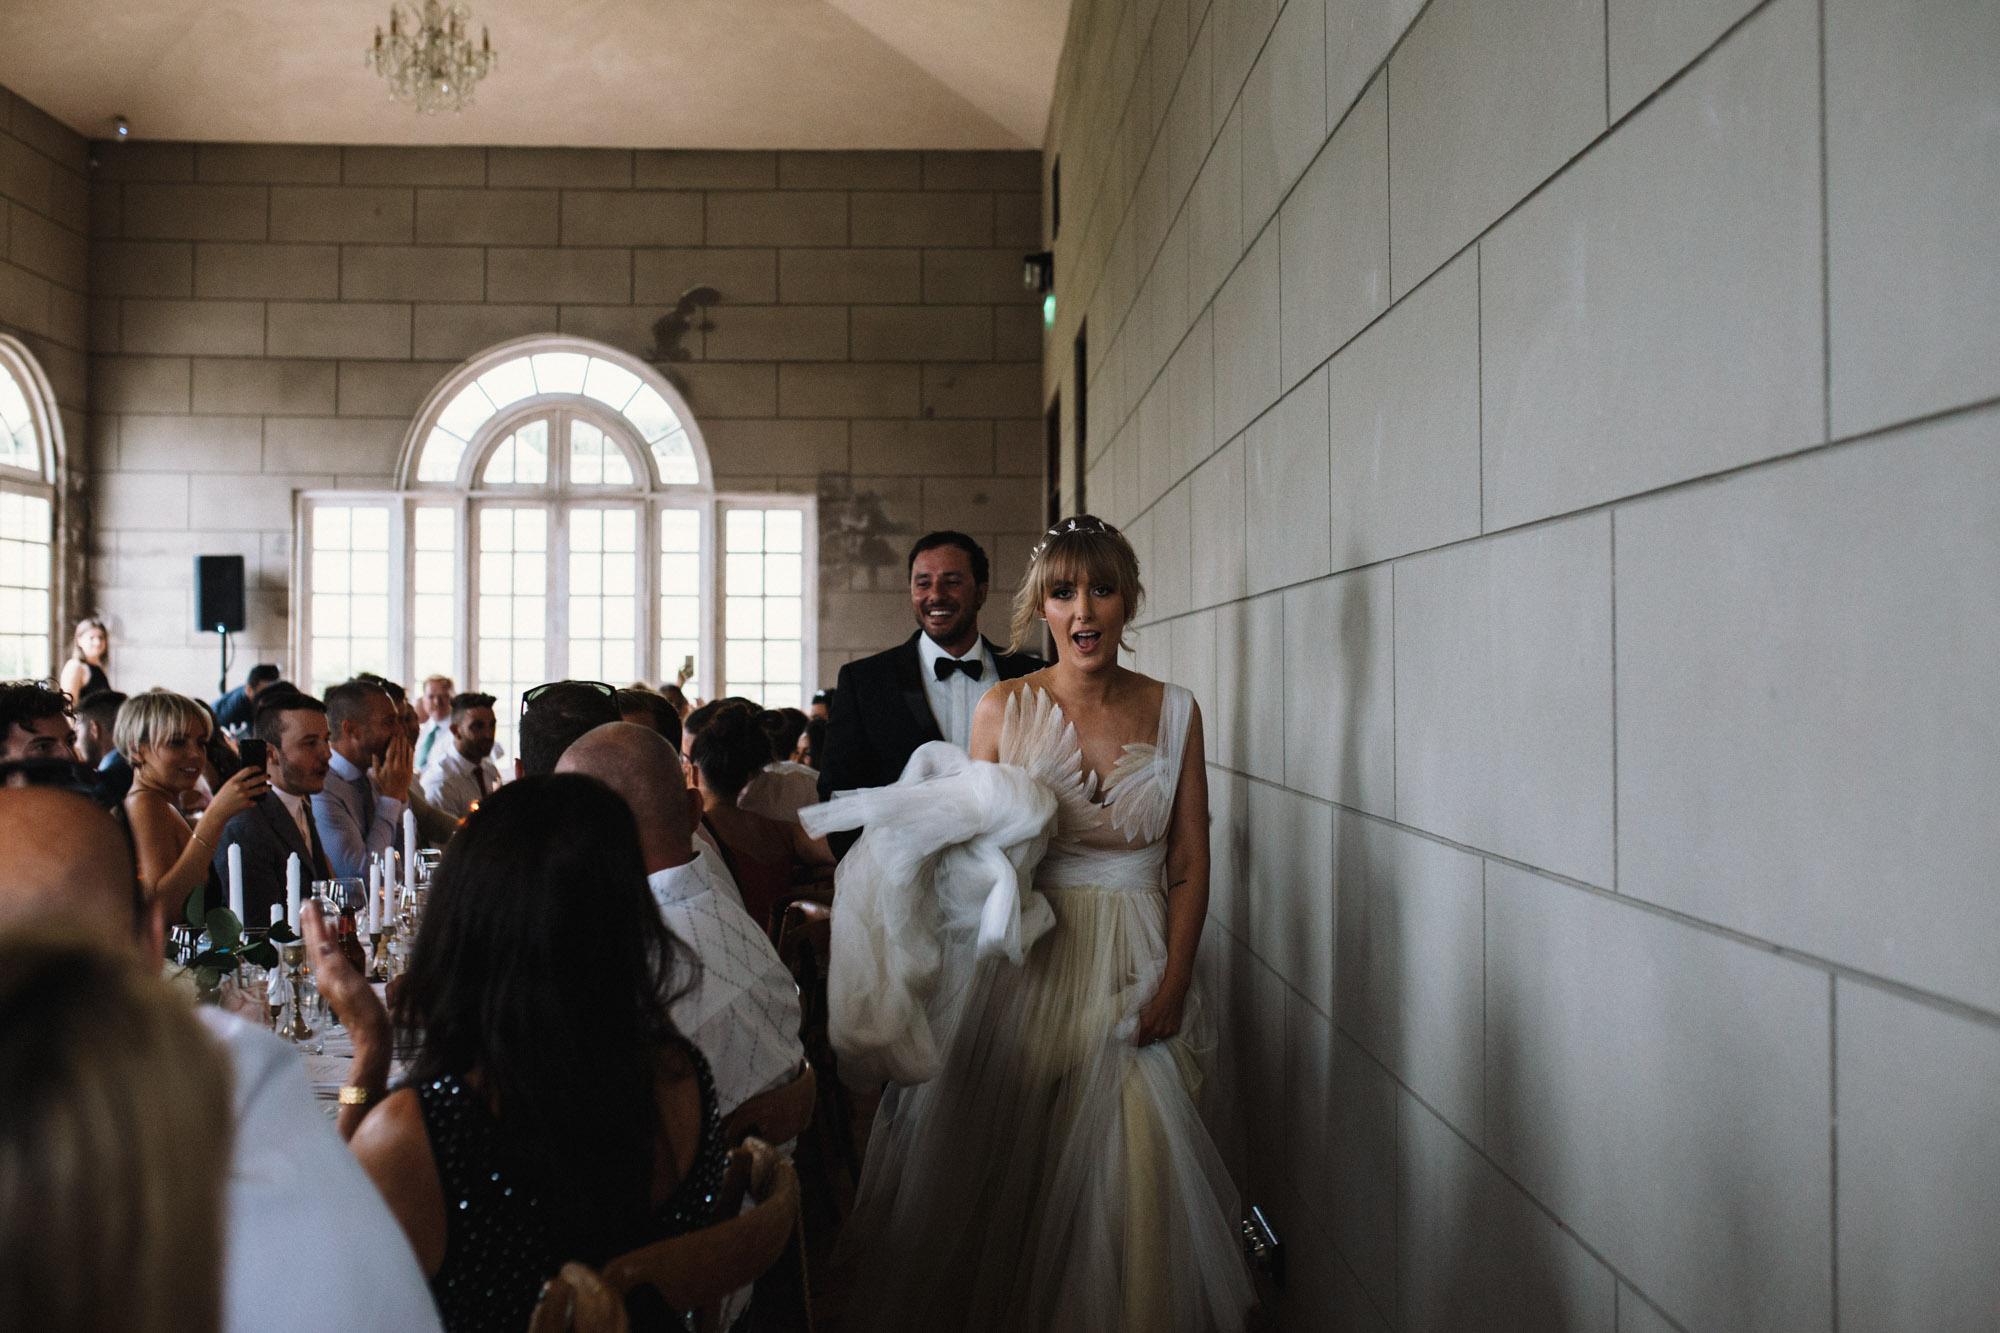 Campbell Point House Wedding HJ + Dean Raphael Weddings-120.jpg